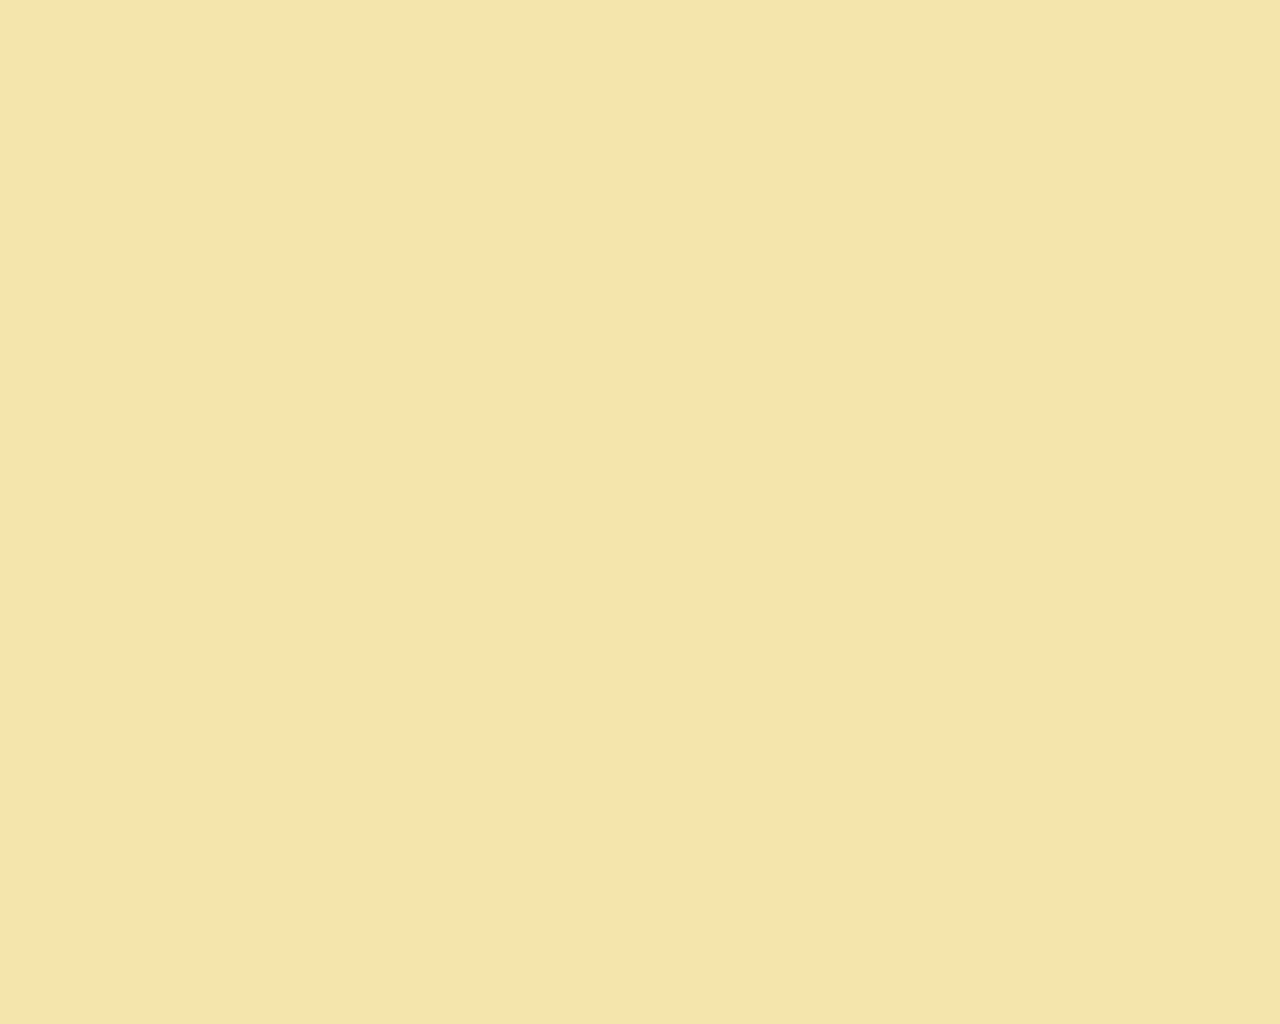 1280x1024 Vanilla Solid Color Background